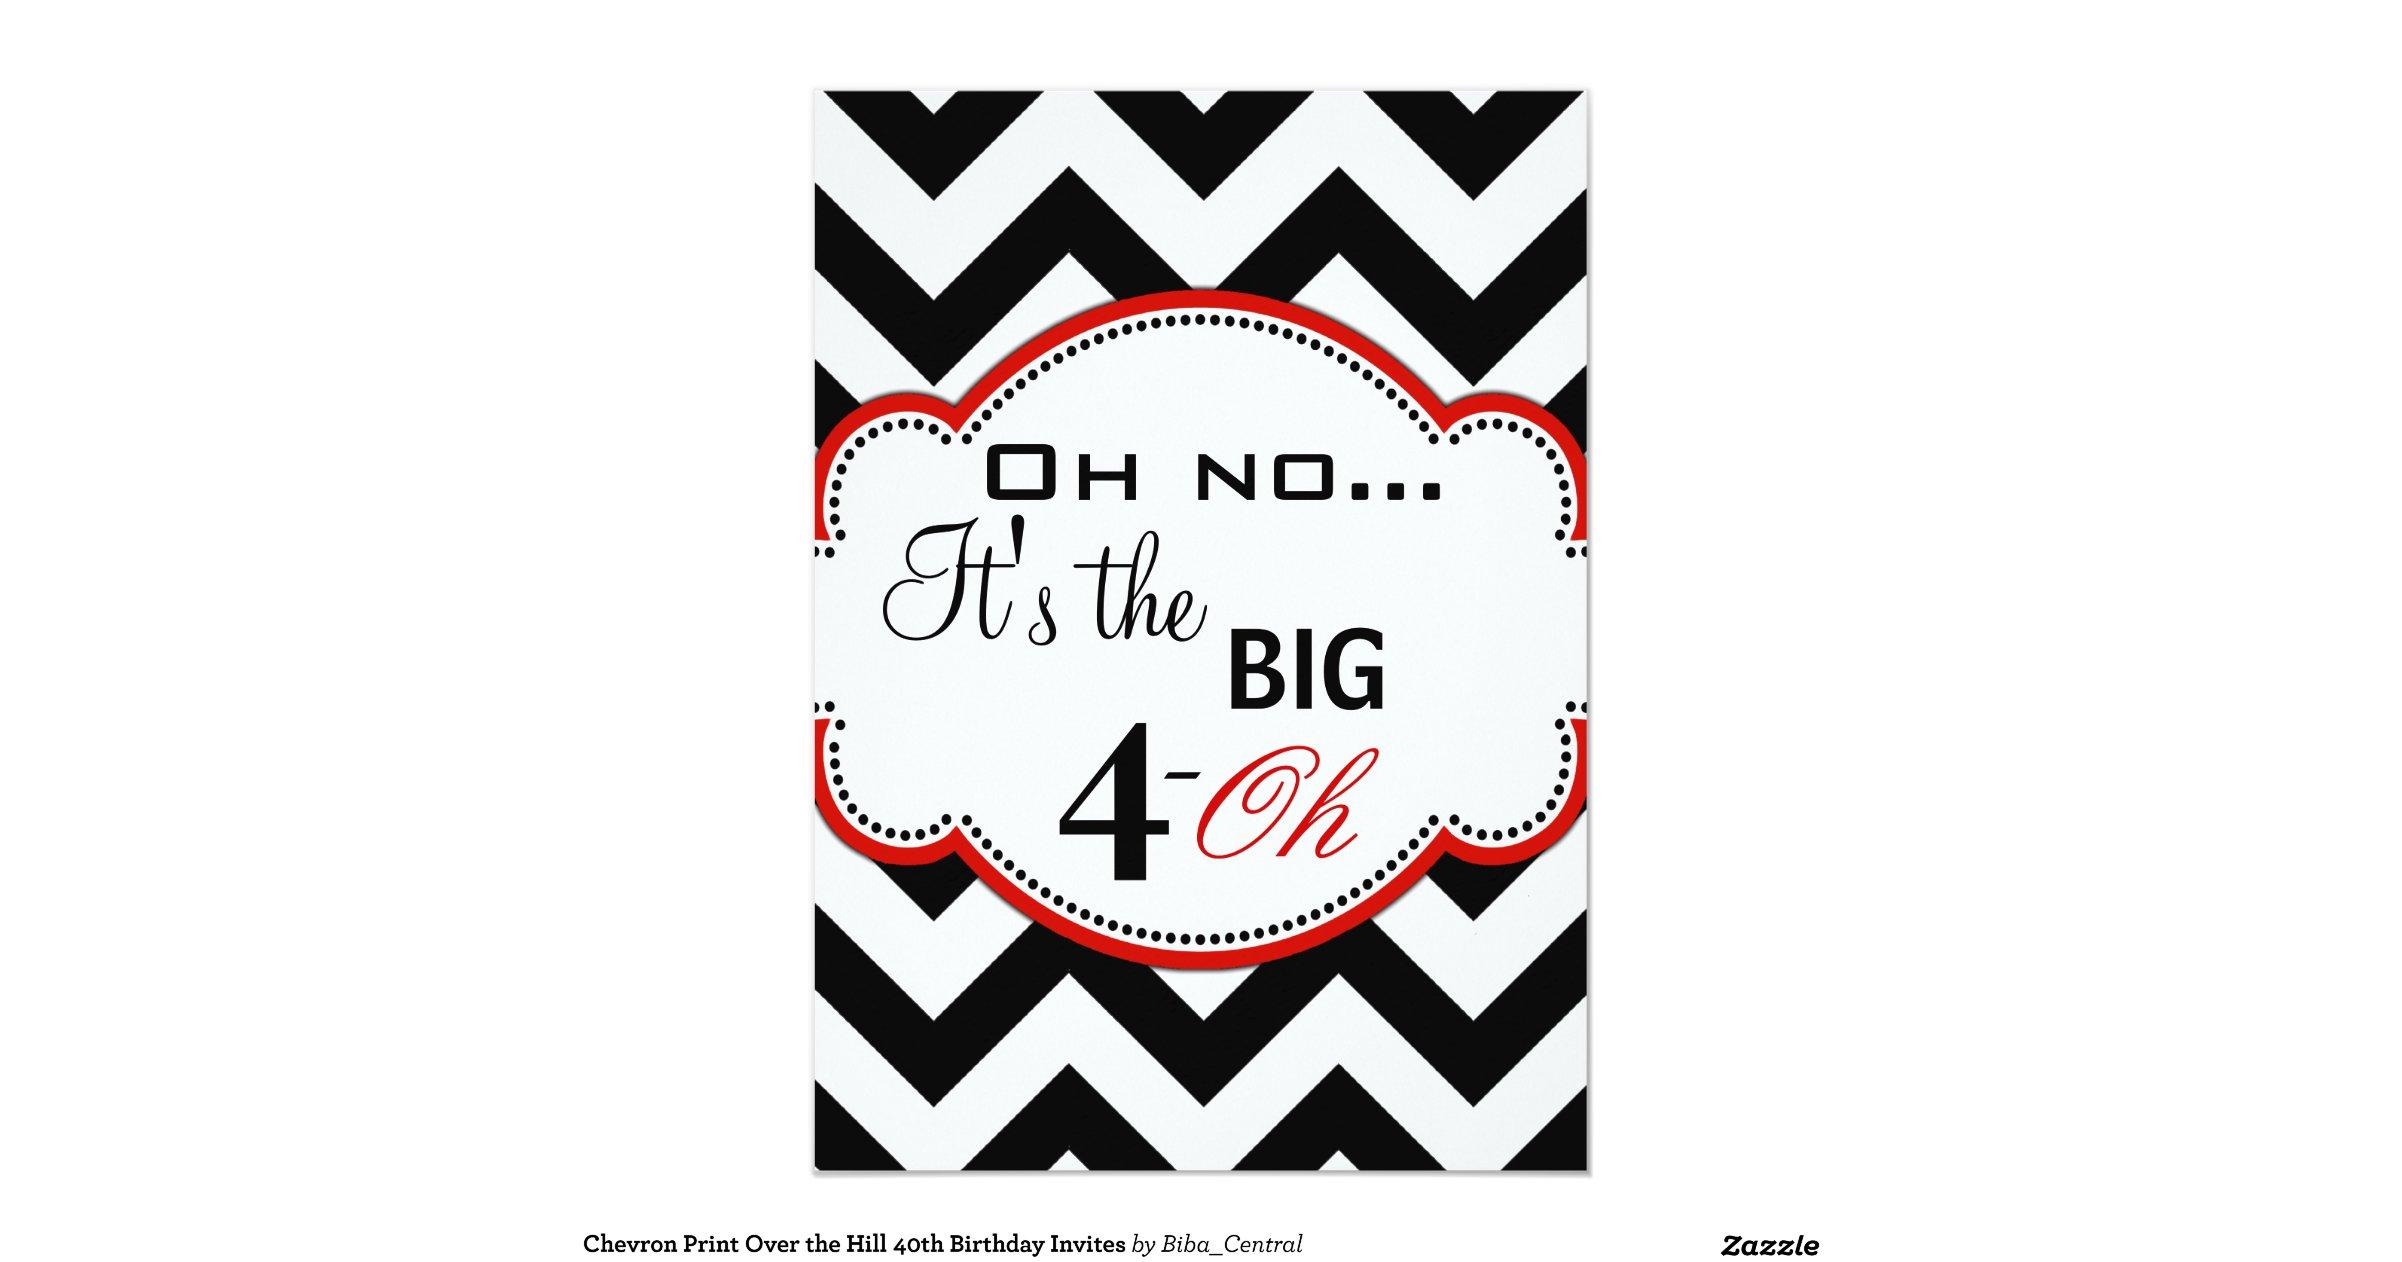 chevron_print_over_the_hill_40th_birthday_invites